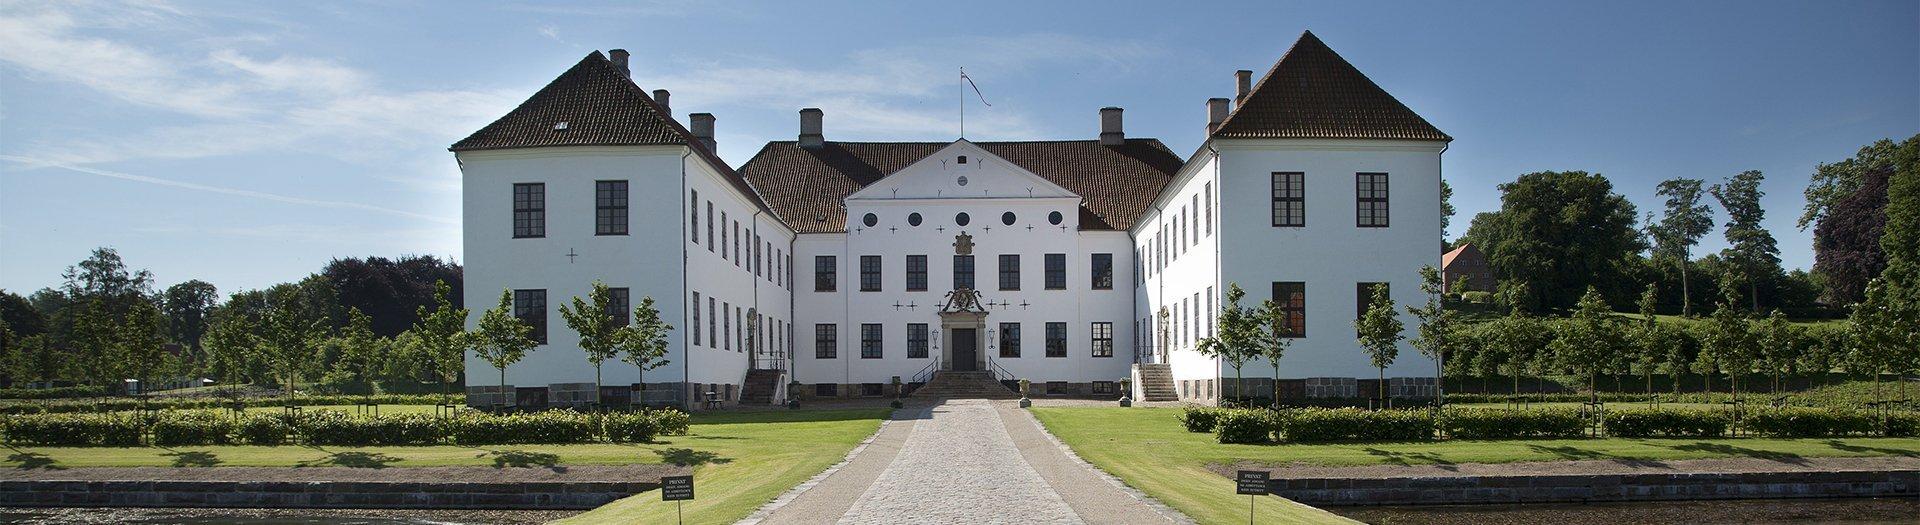 claus holm slot højskole tur